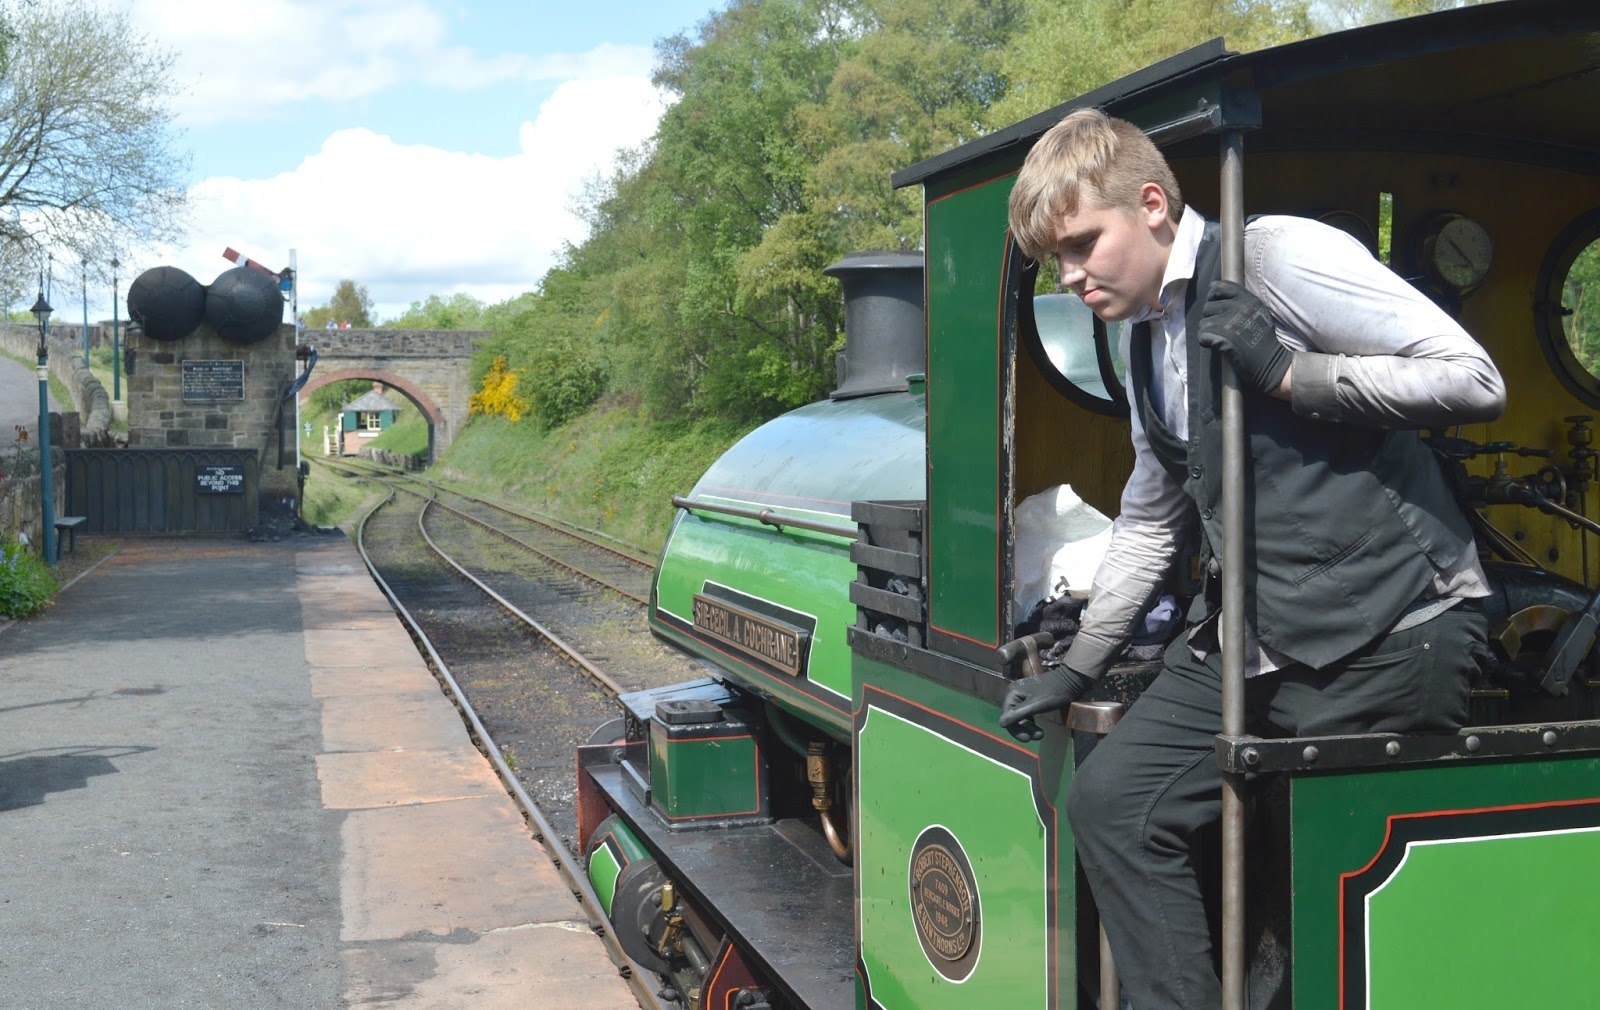 Tanfield Railway Gateshead